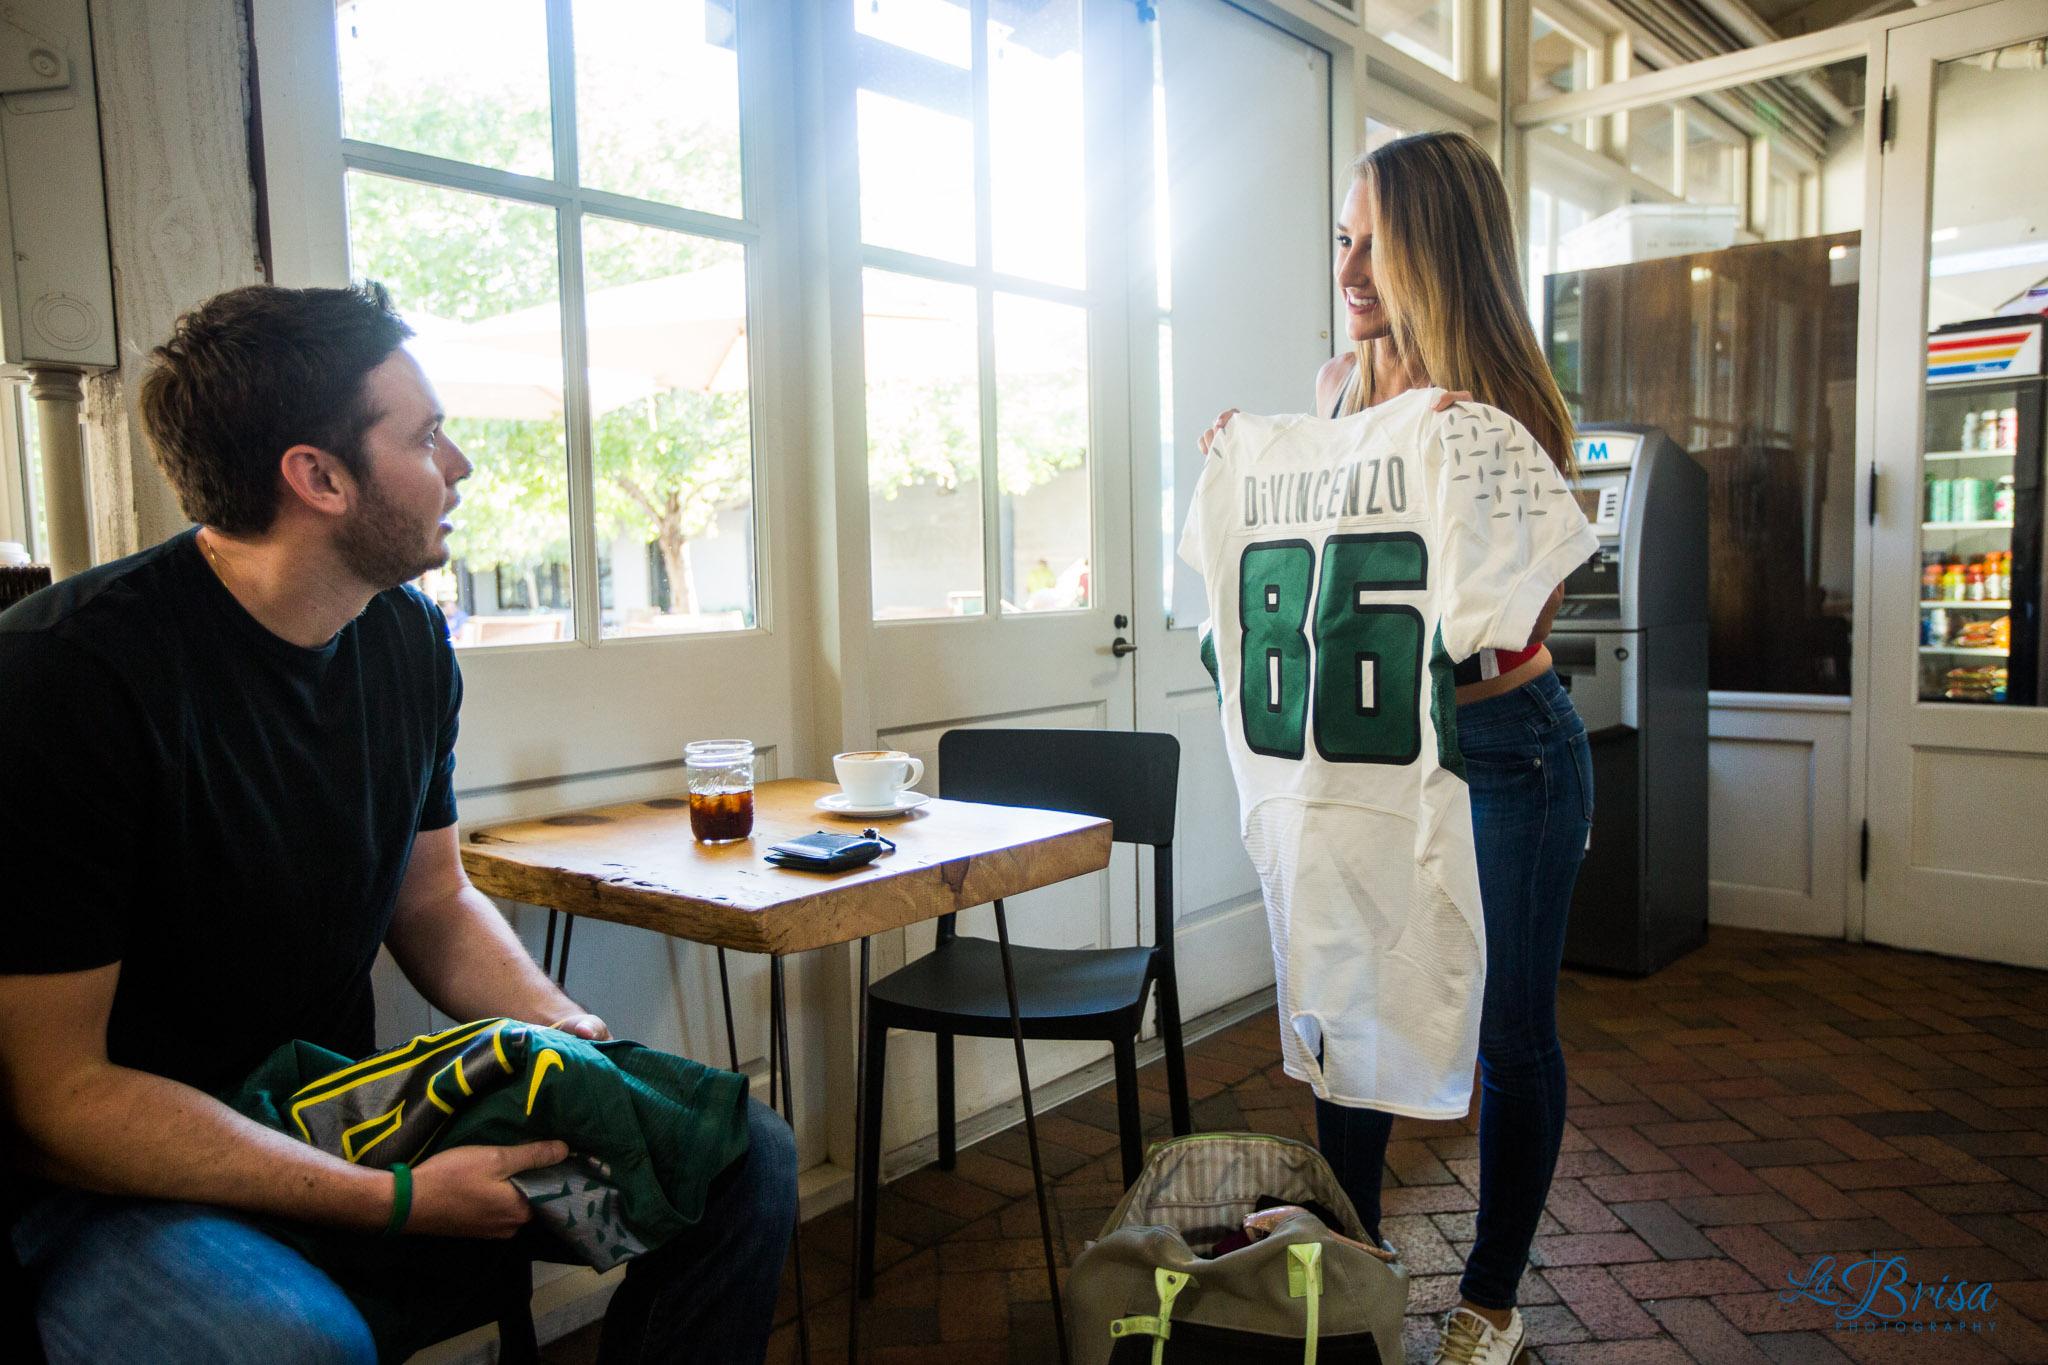 Presta Coffee Engagement College Attire Surprise